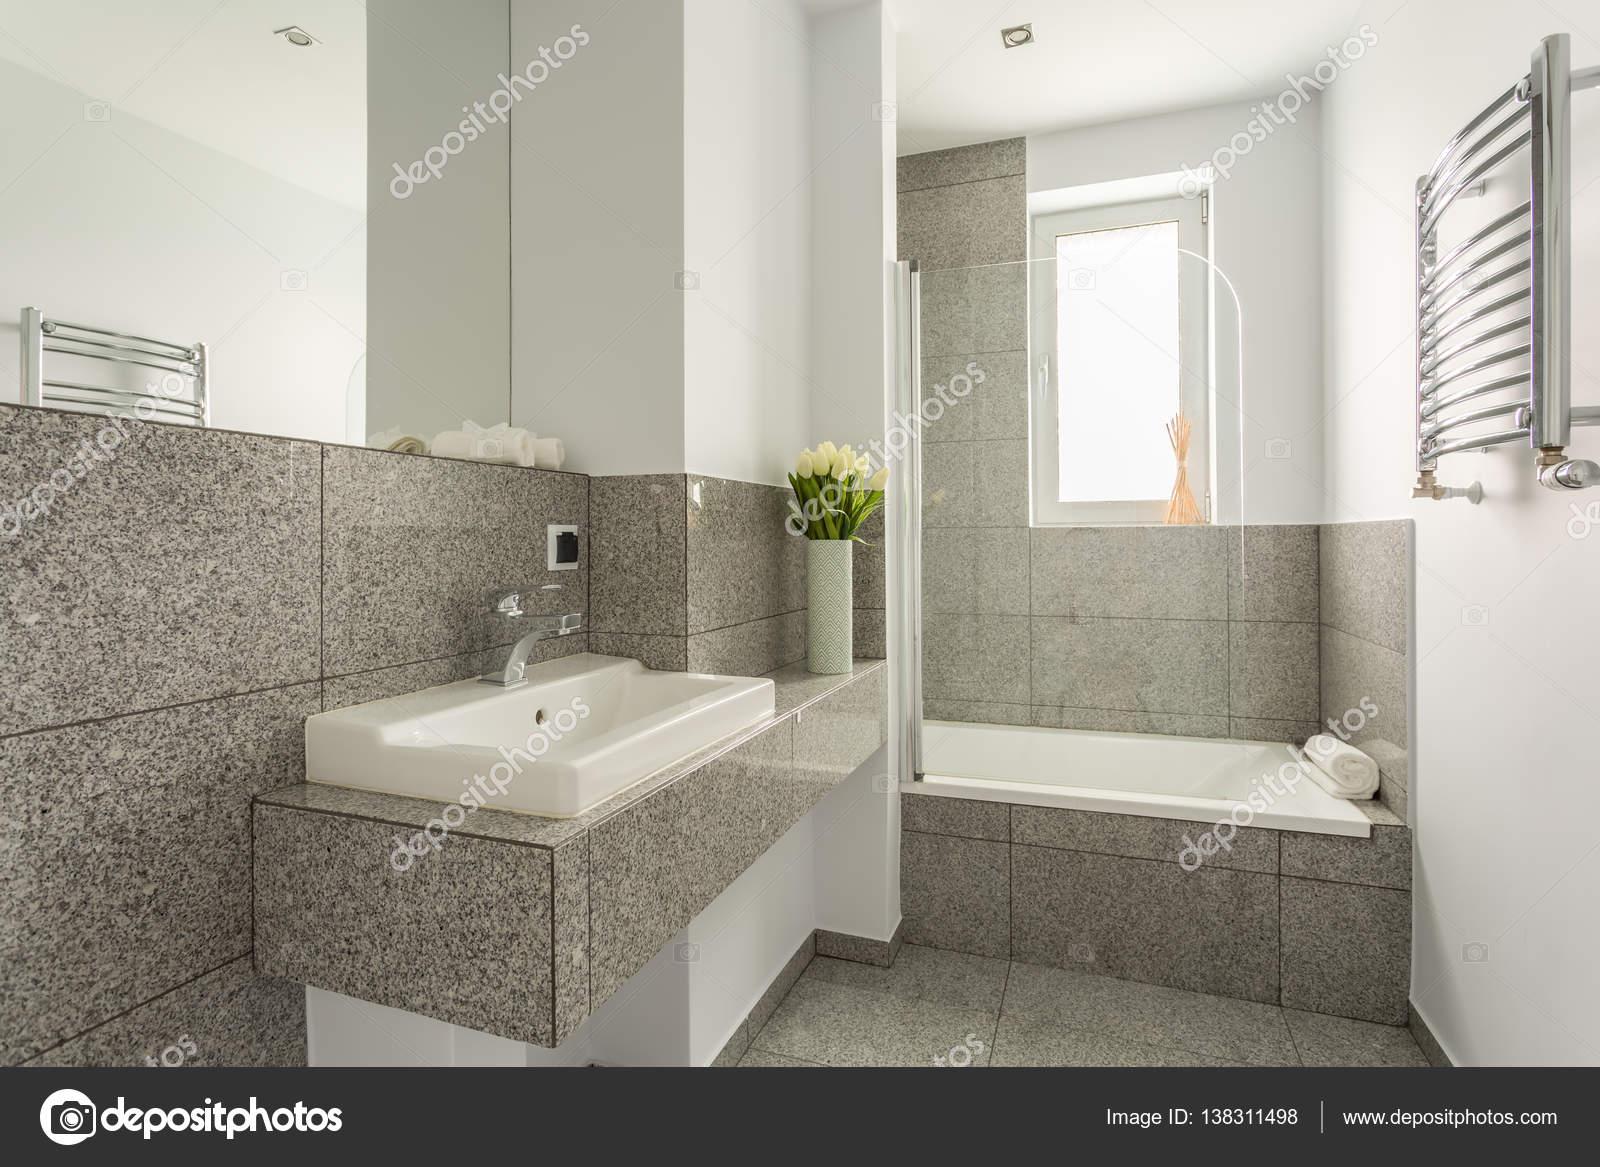 Minimalistische wastafel in granieten badkamer u stockfoto